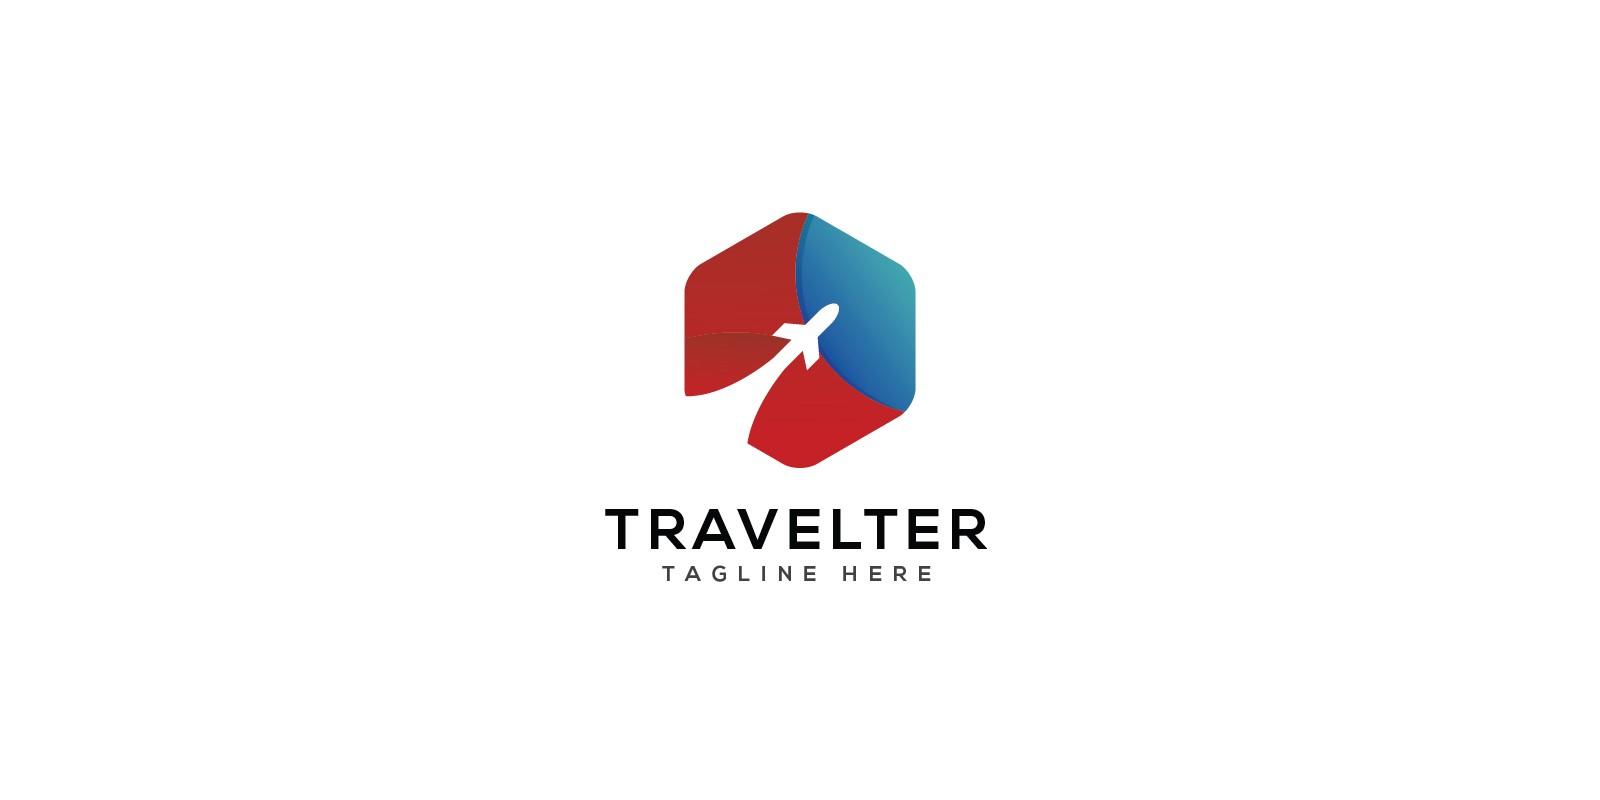 Travelter Logo